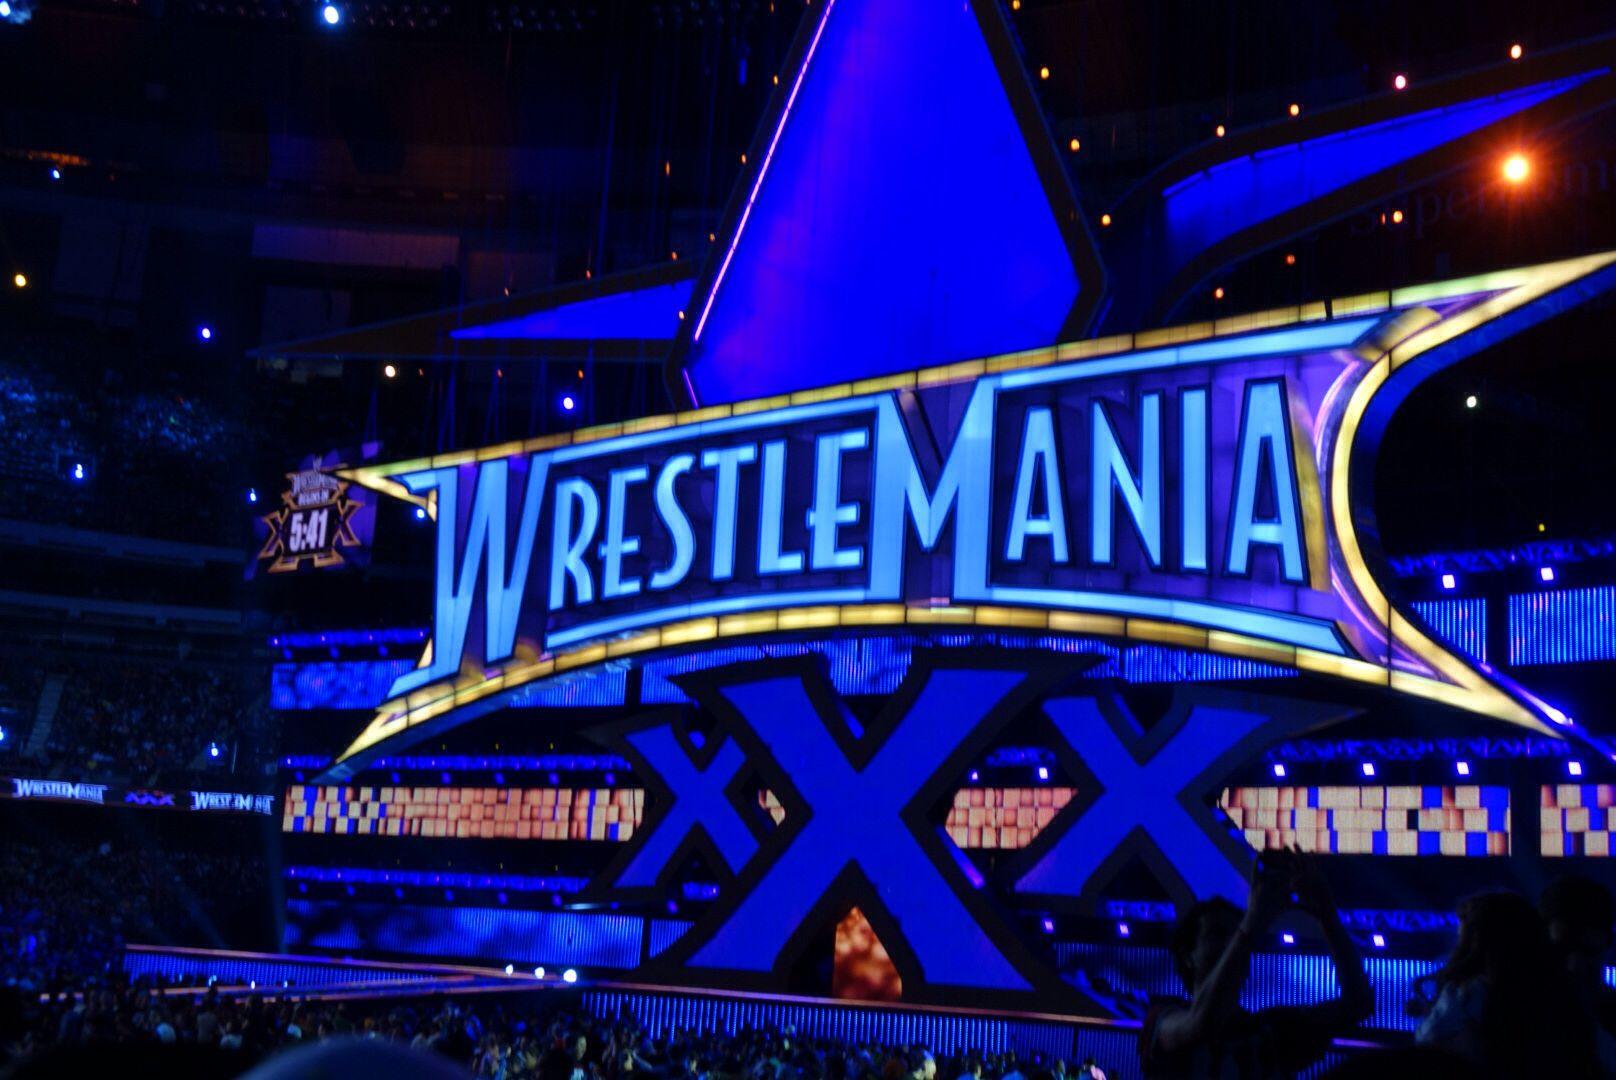 I was there. Wrestlemania, Wwf, Wwe